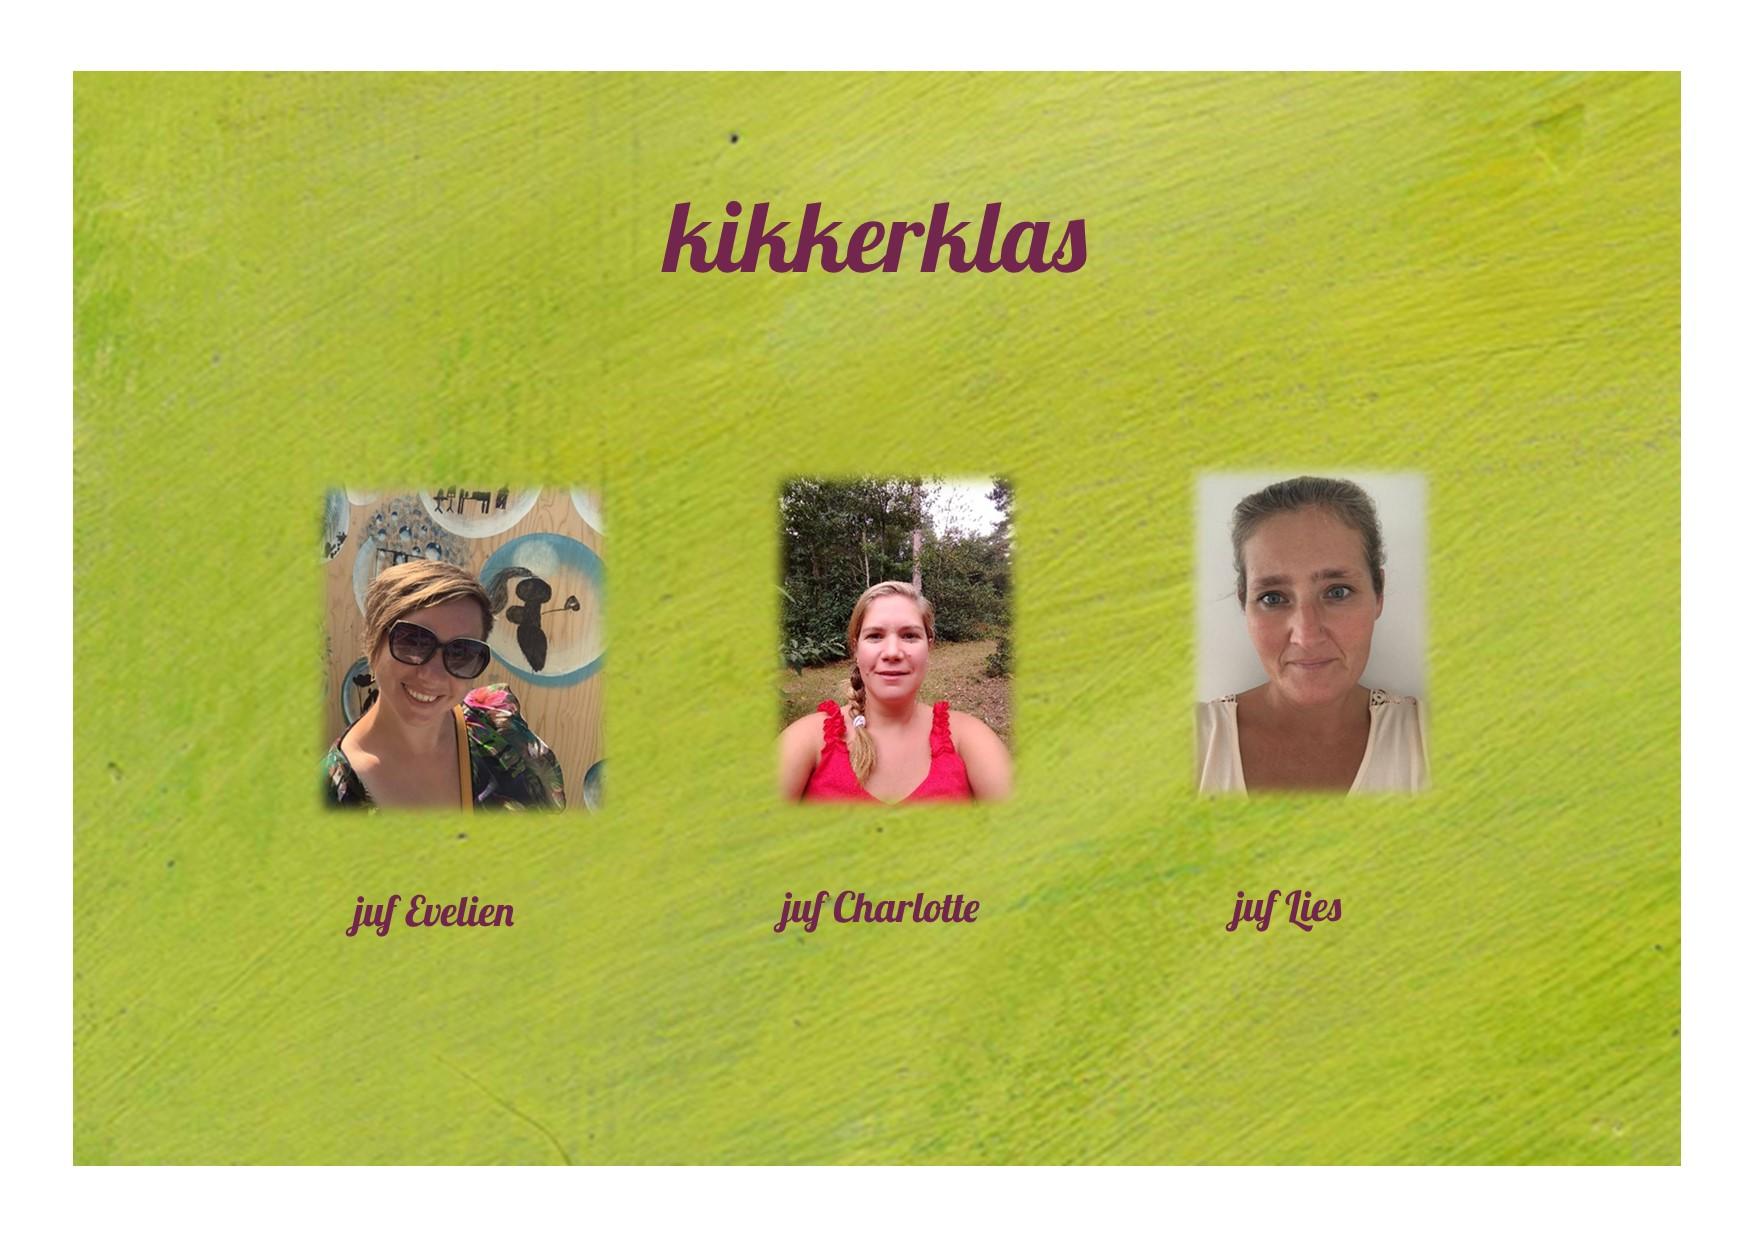 <p>3K: juf Evelien, juf Charlotte en juf Lies</p>